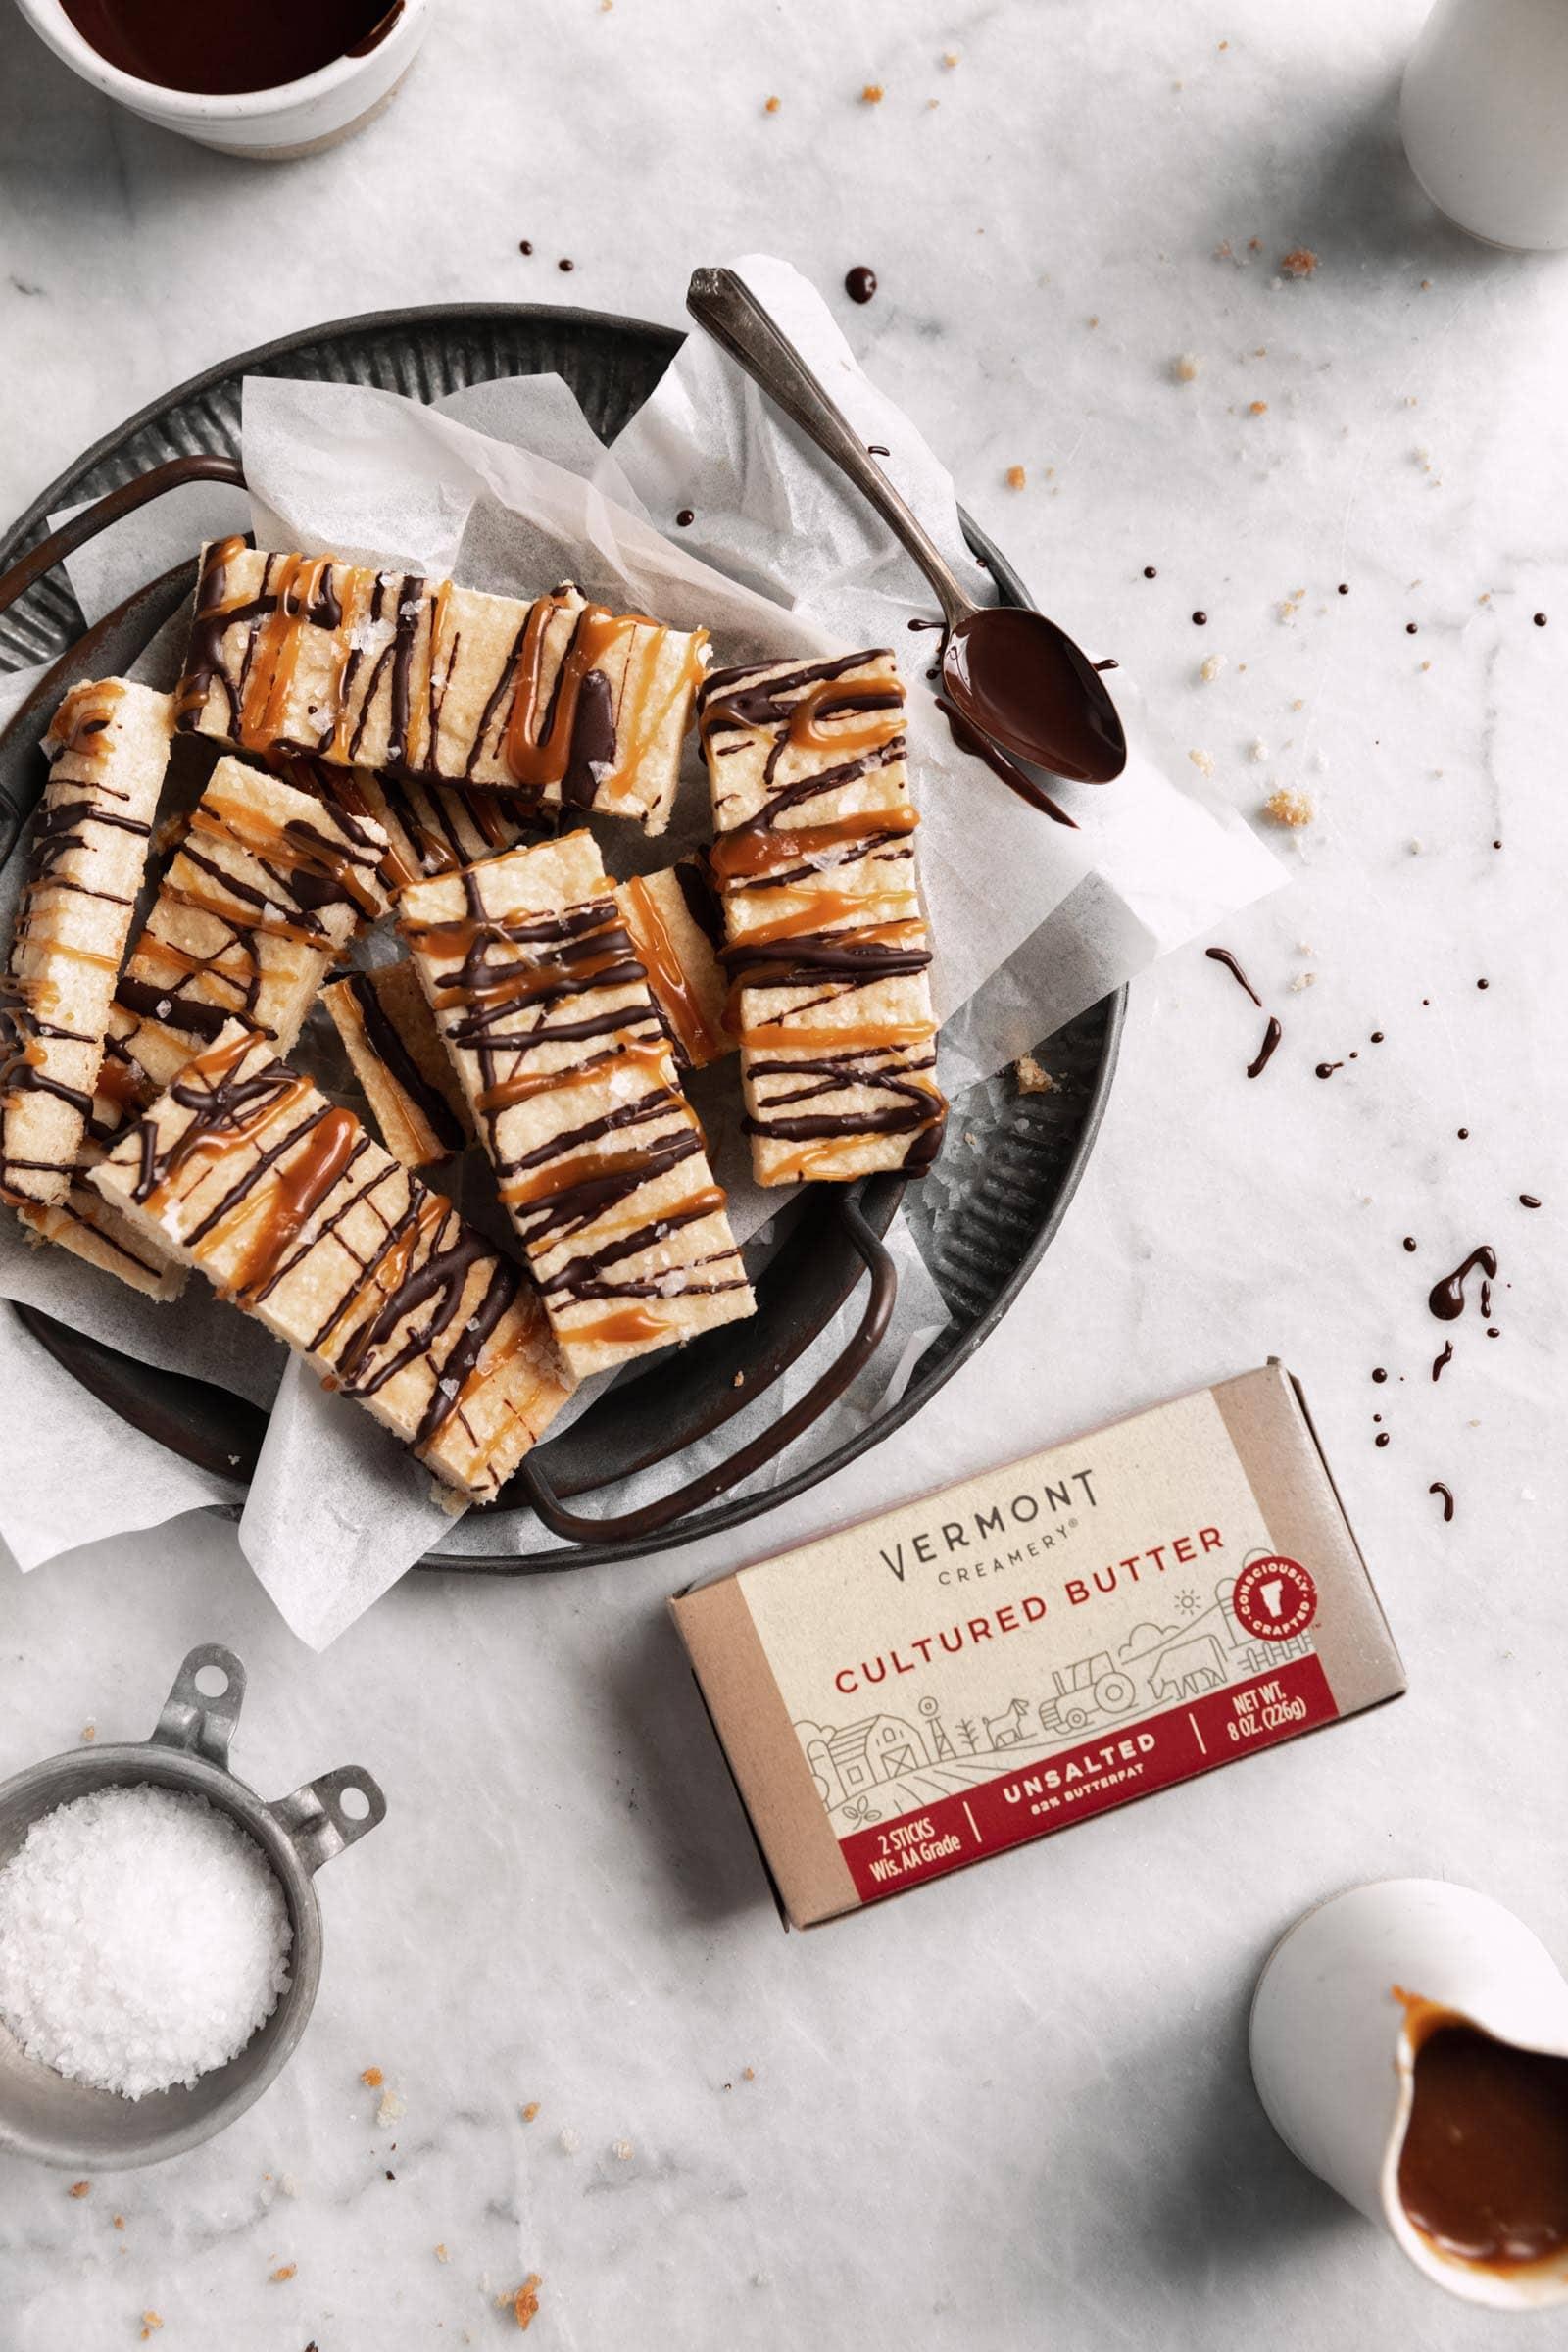 vermont creamery cultured butter shortbread bars